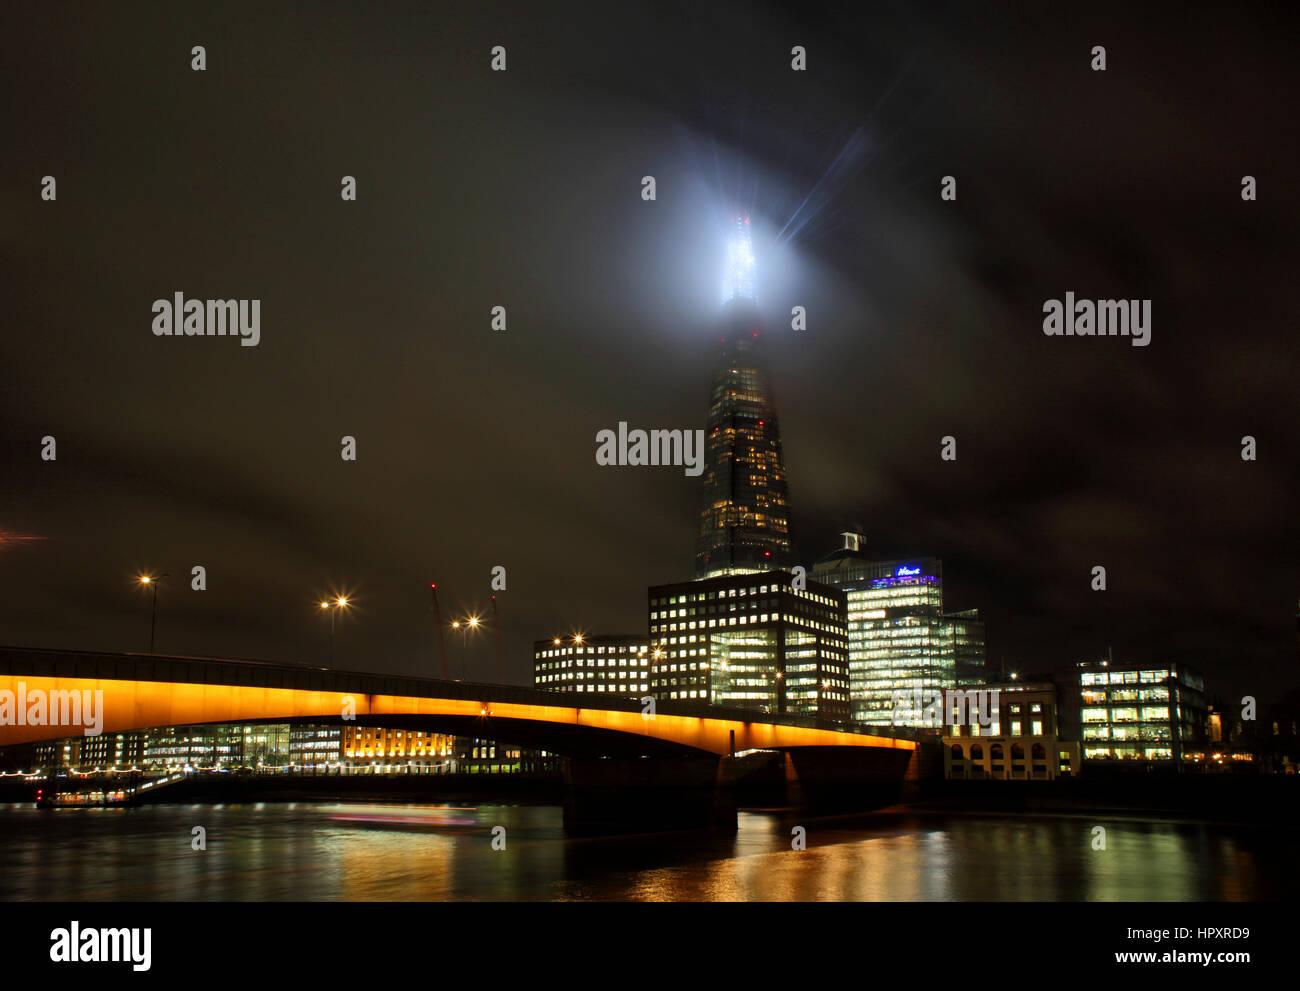 The Shard and New London Bridge at night, London, England. - Stock Image